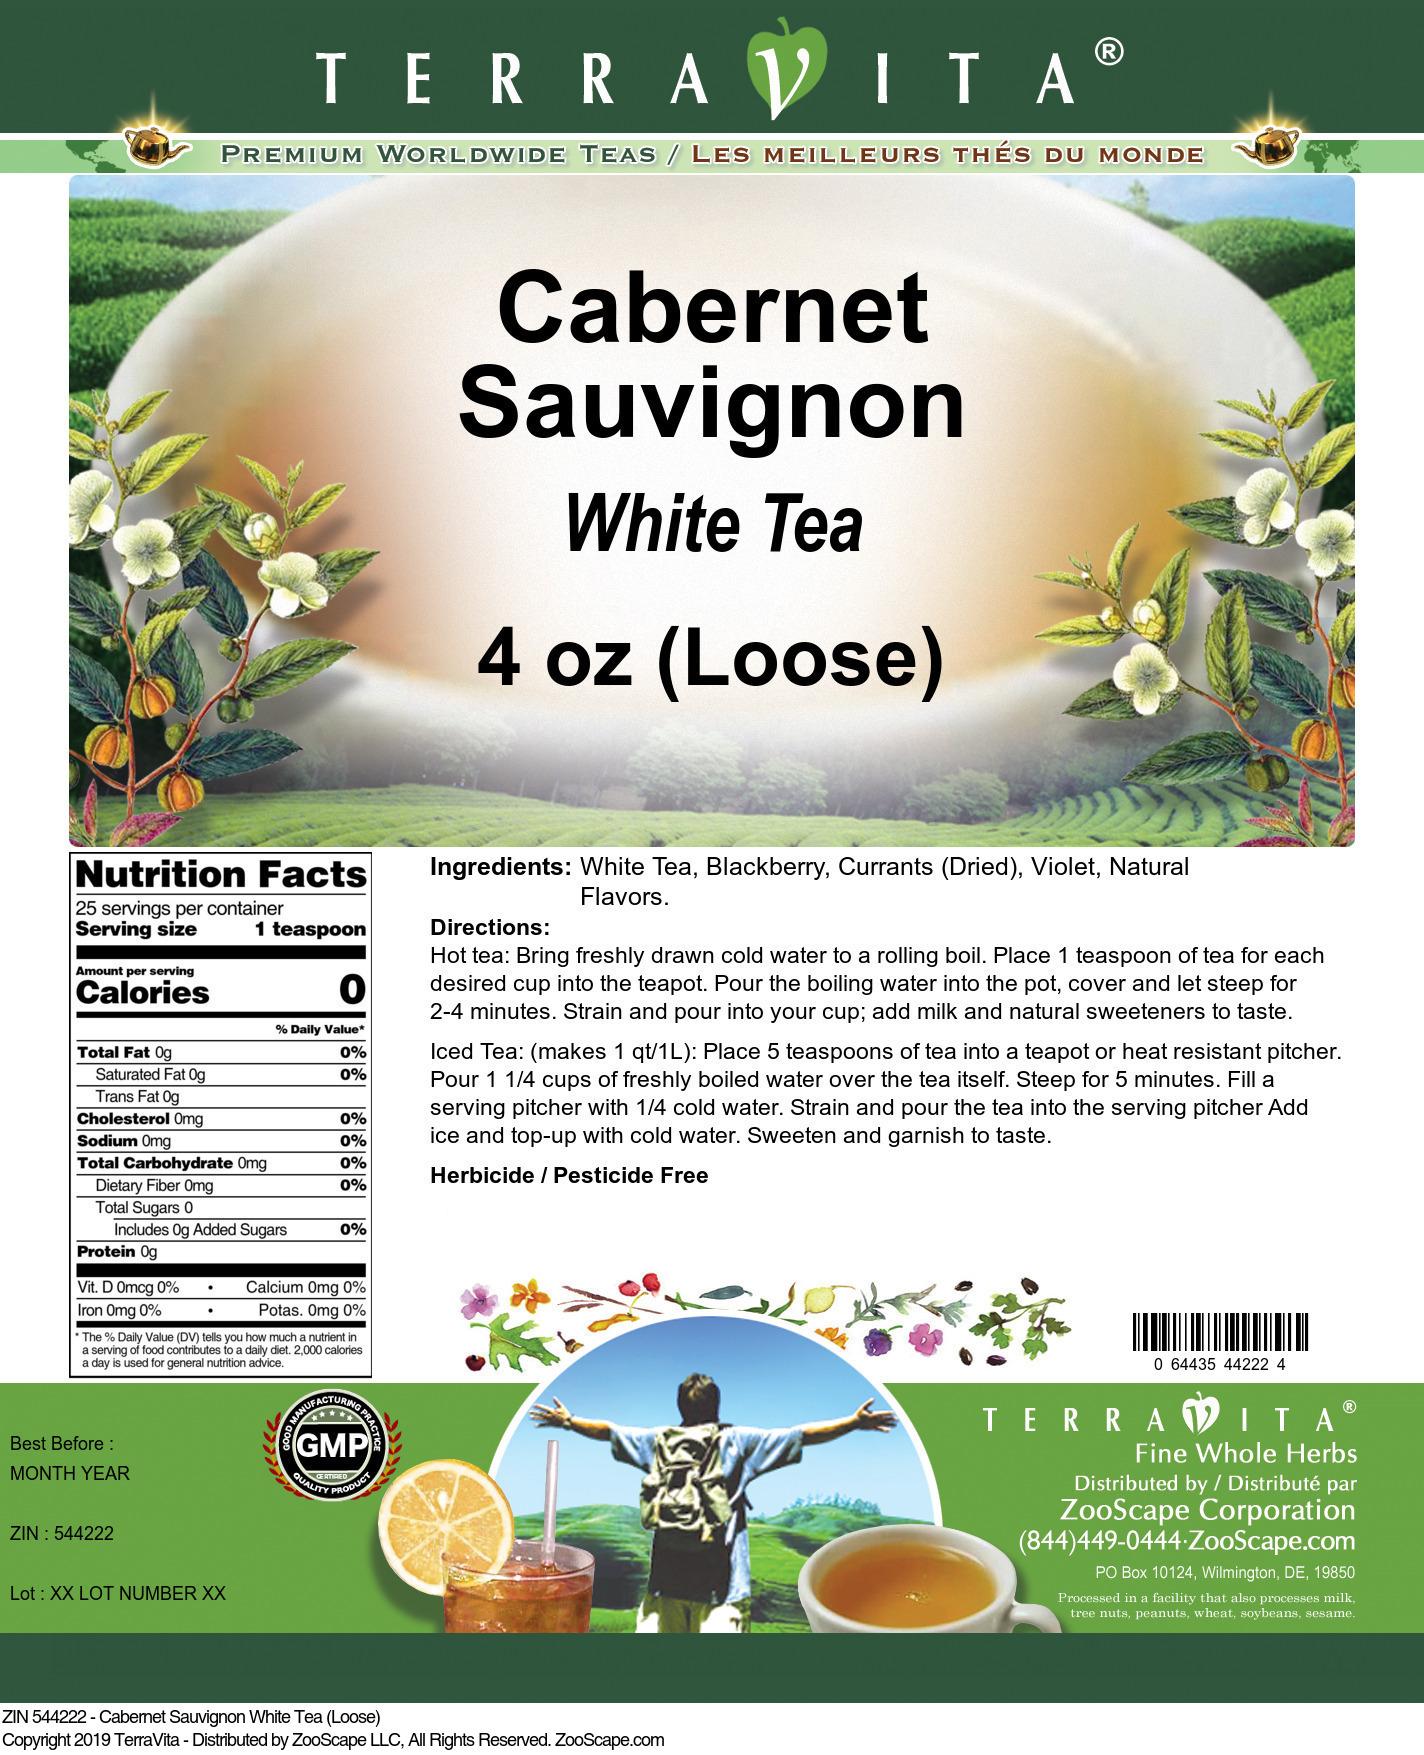 Cabernet Sauvignon White Tea